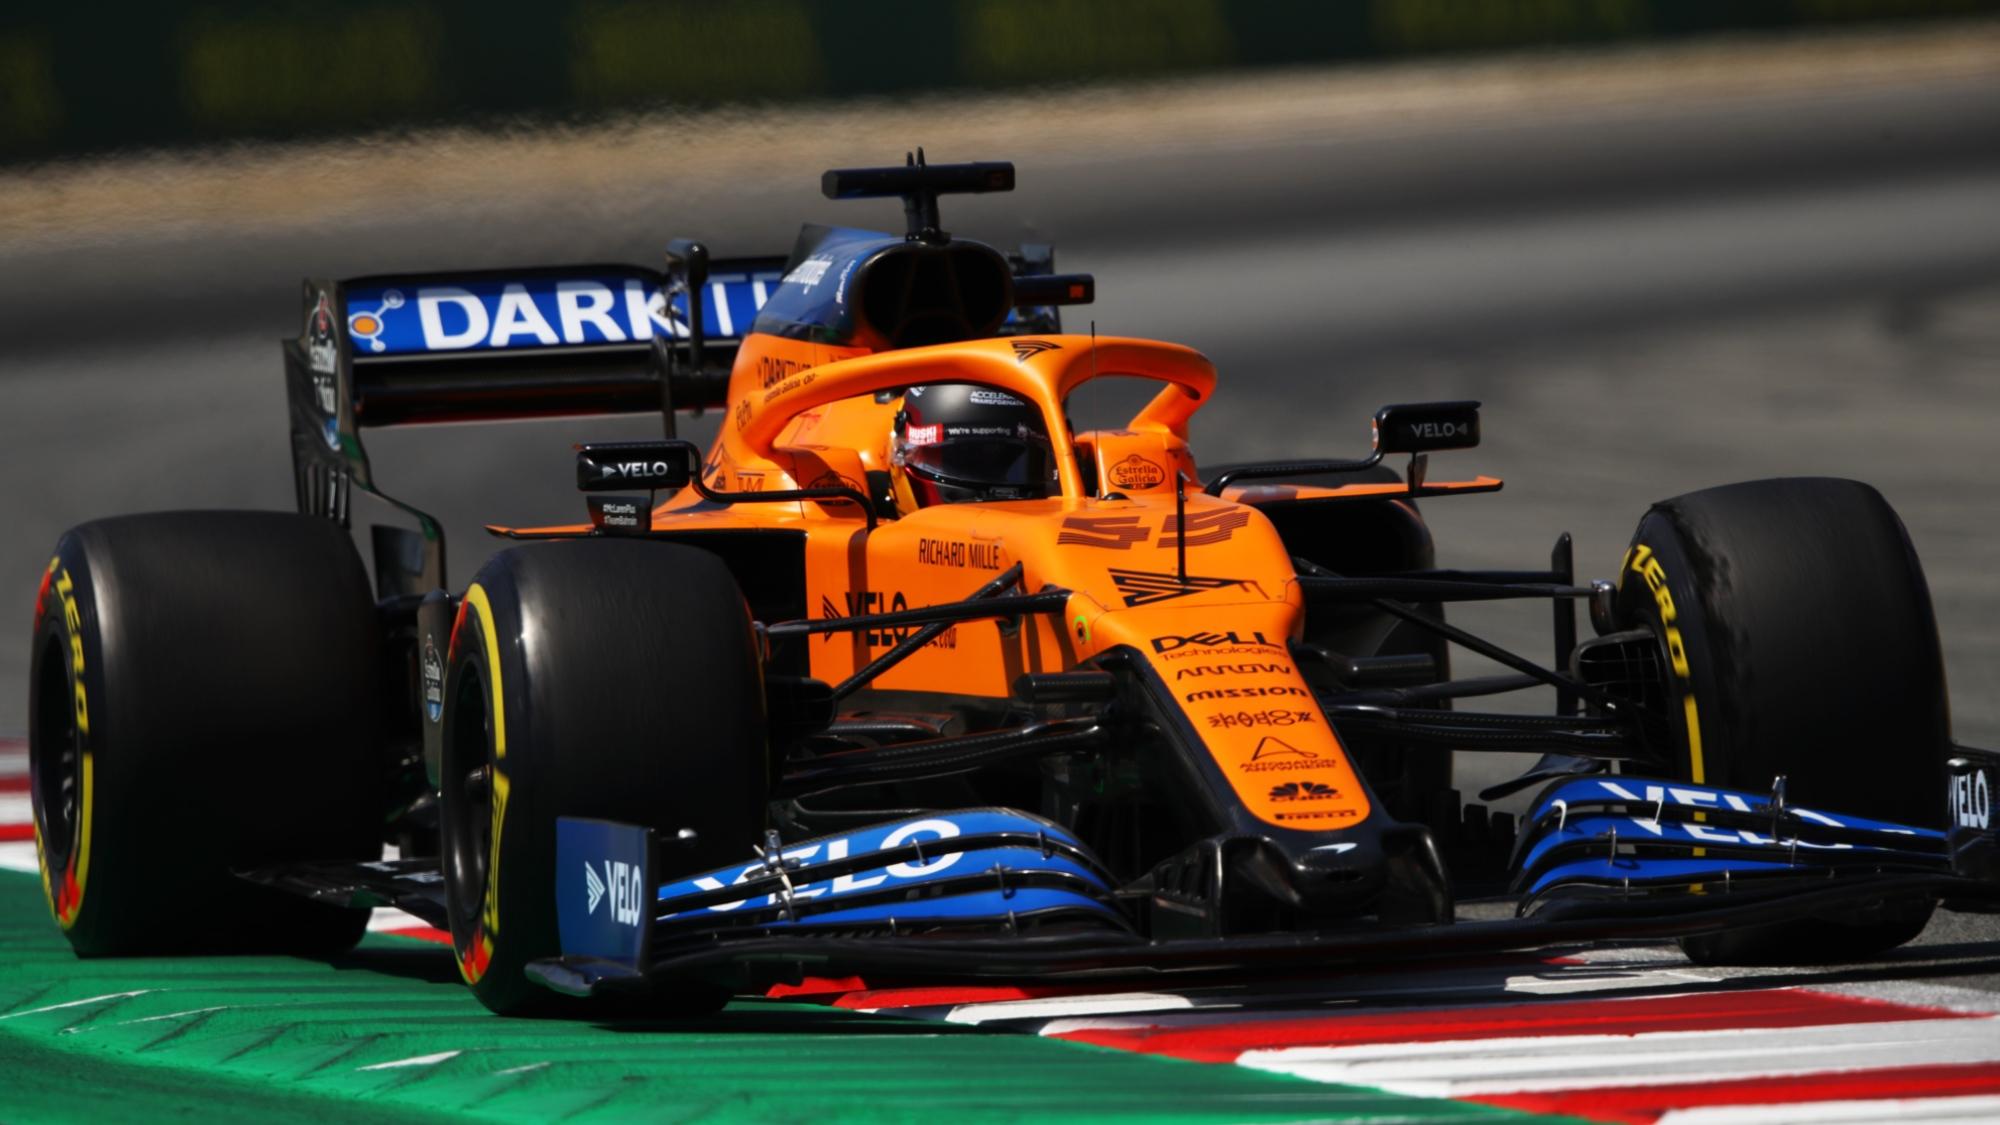 Carlos Sainz, 2020 Spanish GP